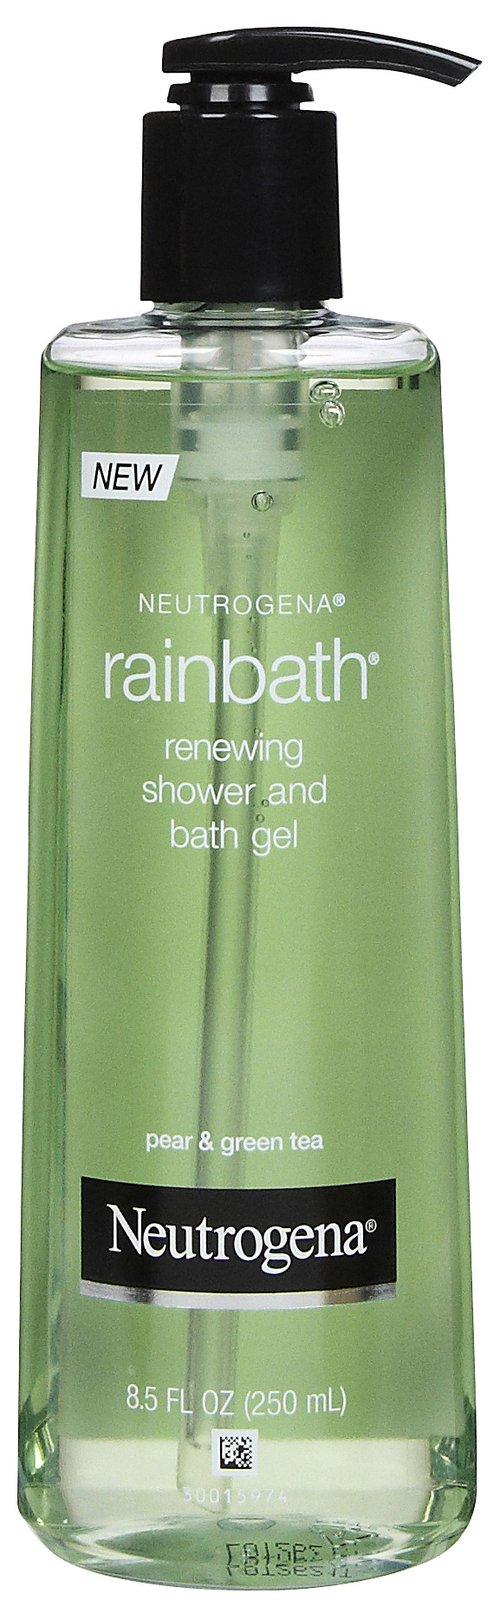 Neutrogena Rainbath Pear Green Tea Rainbath Best Price Bath